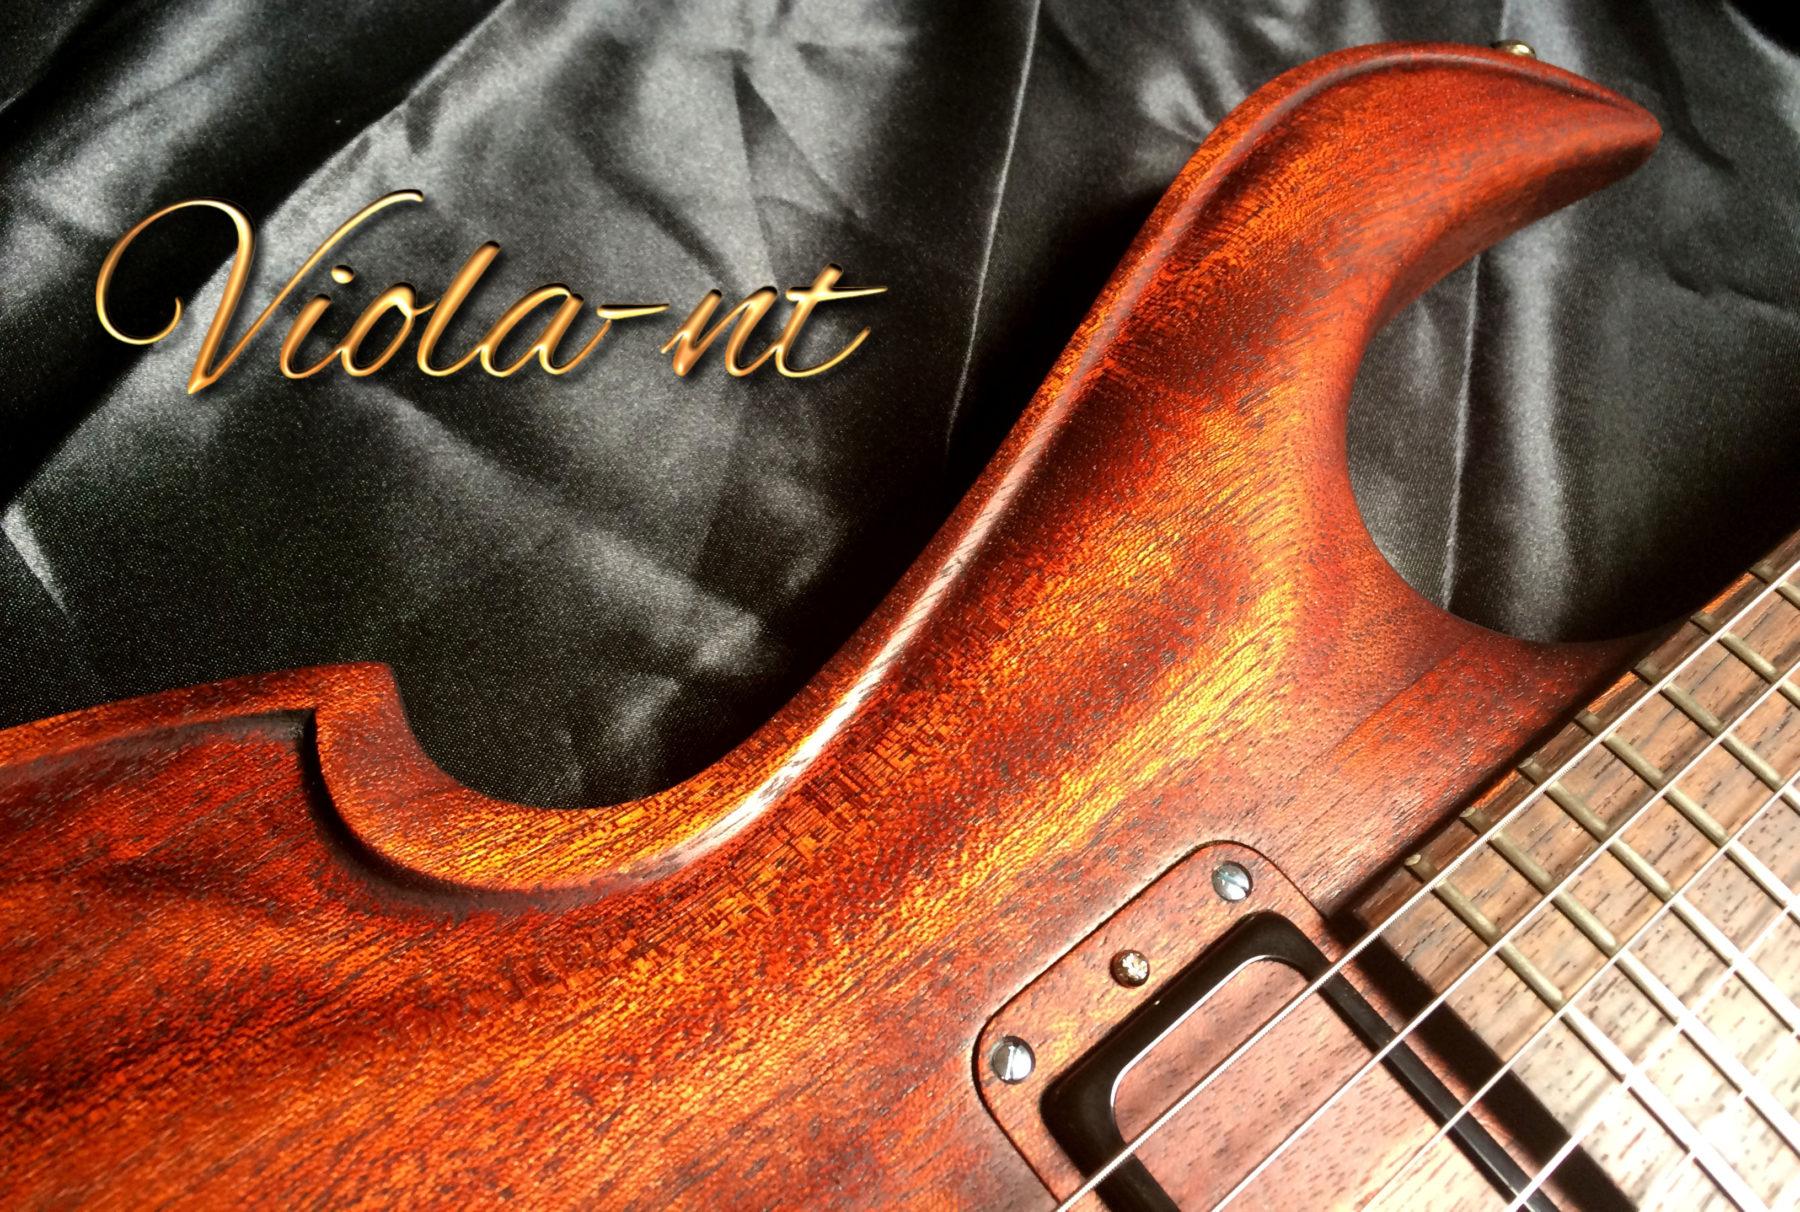 viola-nt violin body